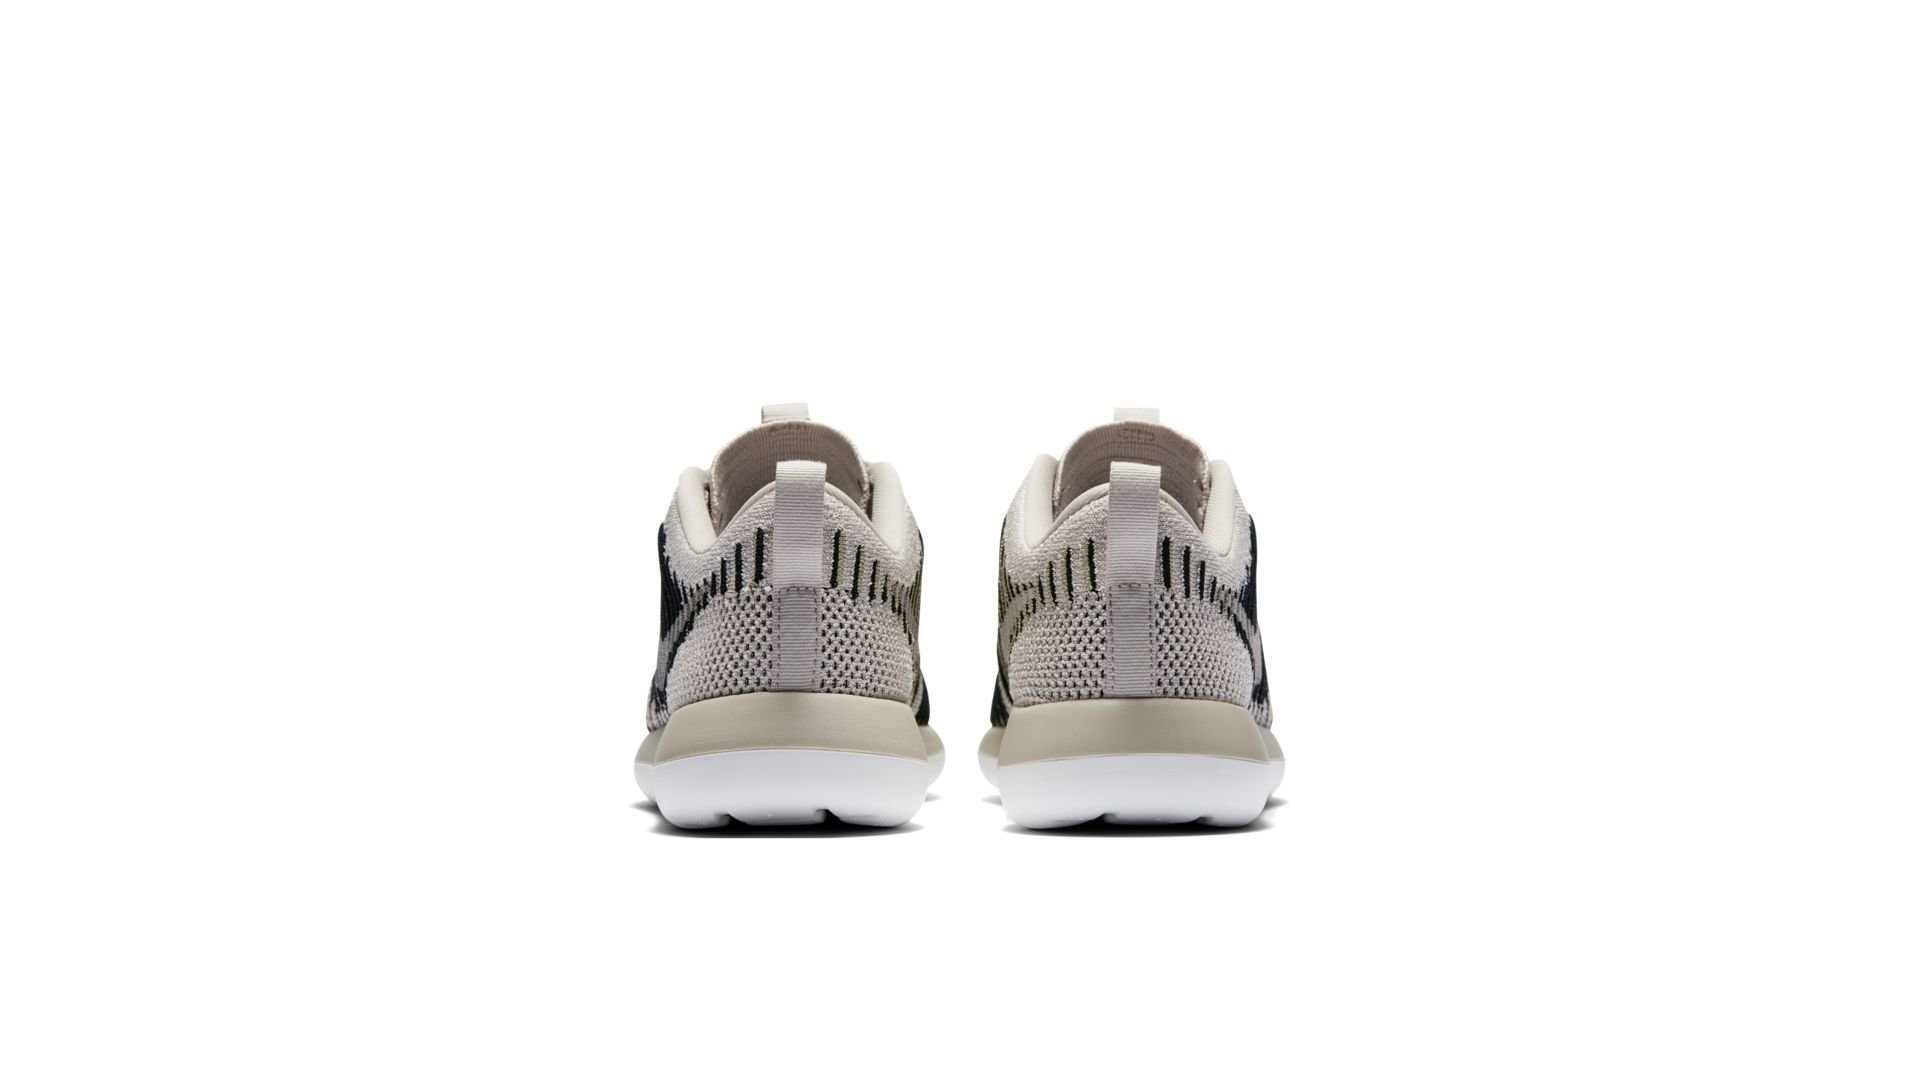 Nike Roshe Two Flyknit Neutral Olive (W) (844929-200)